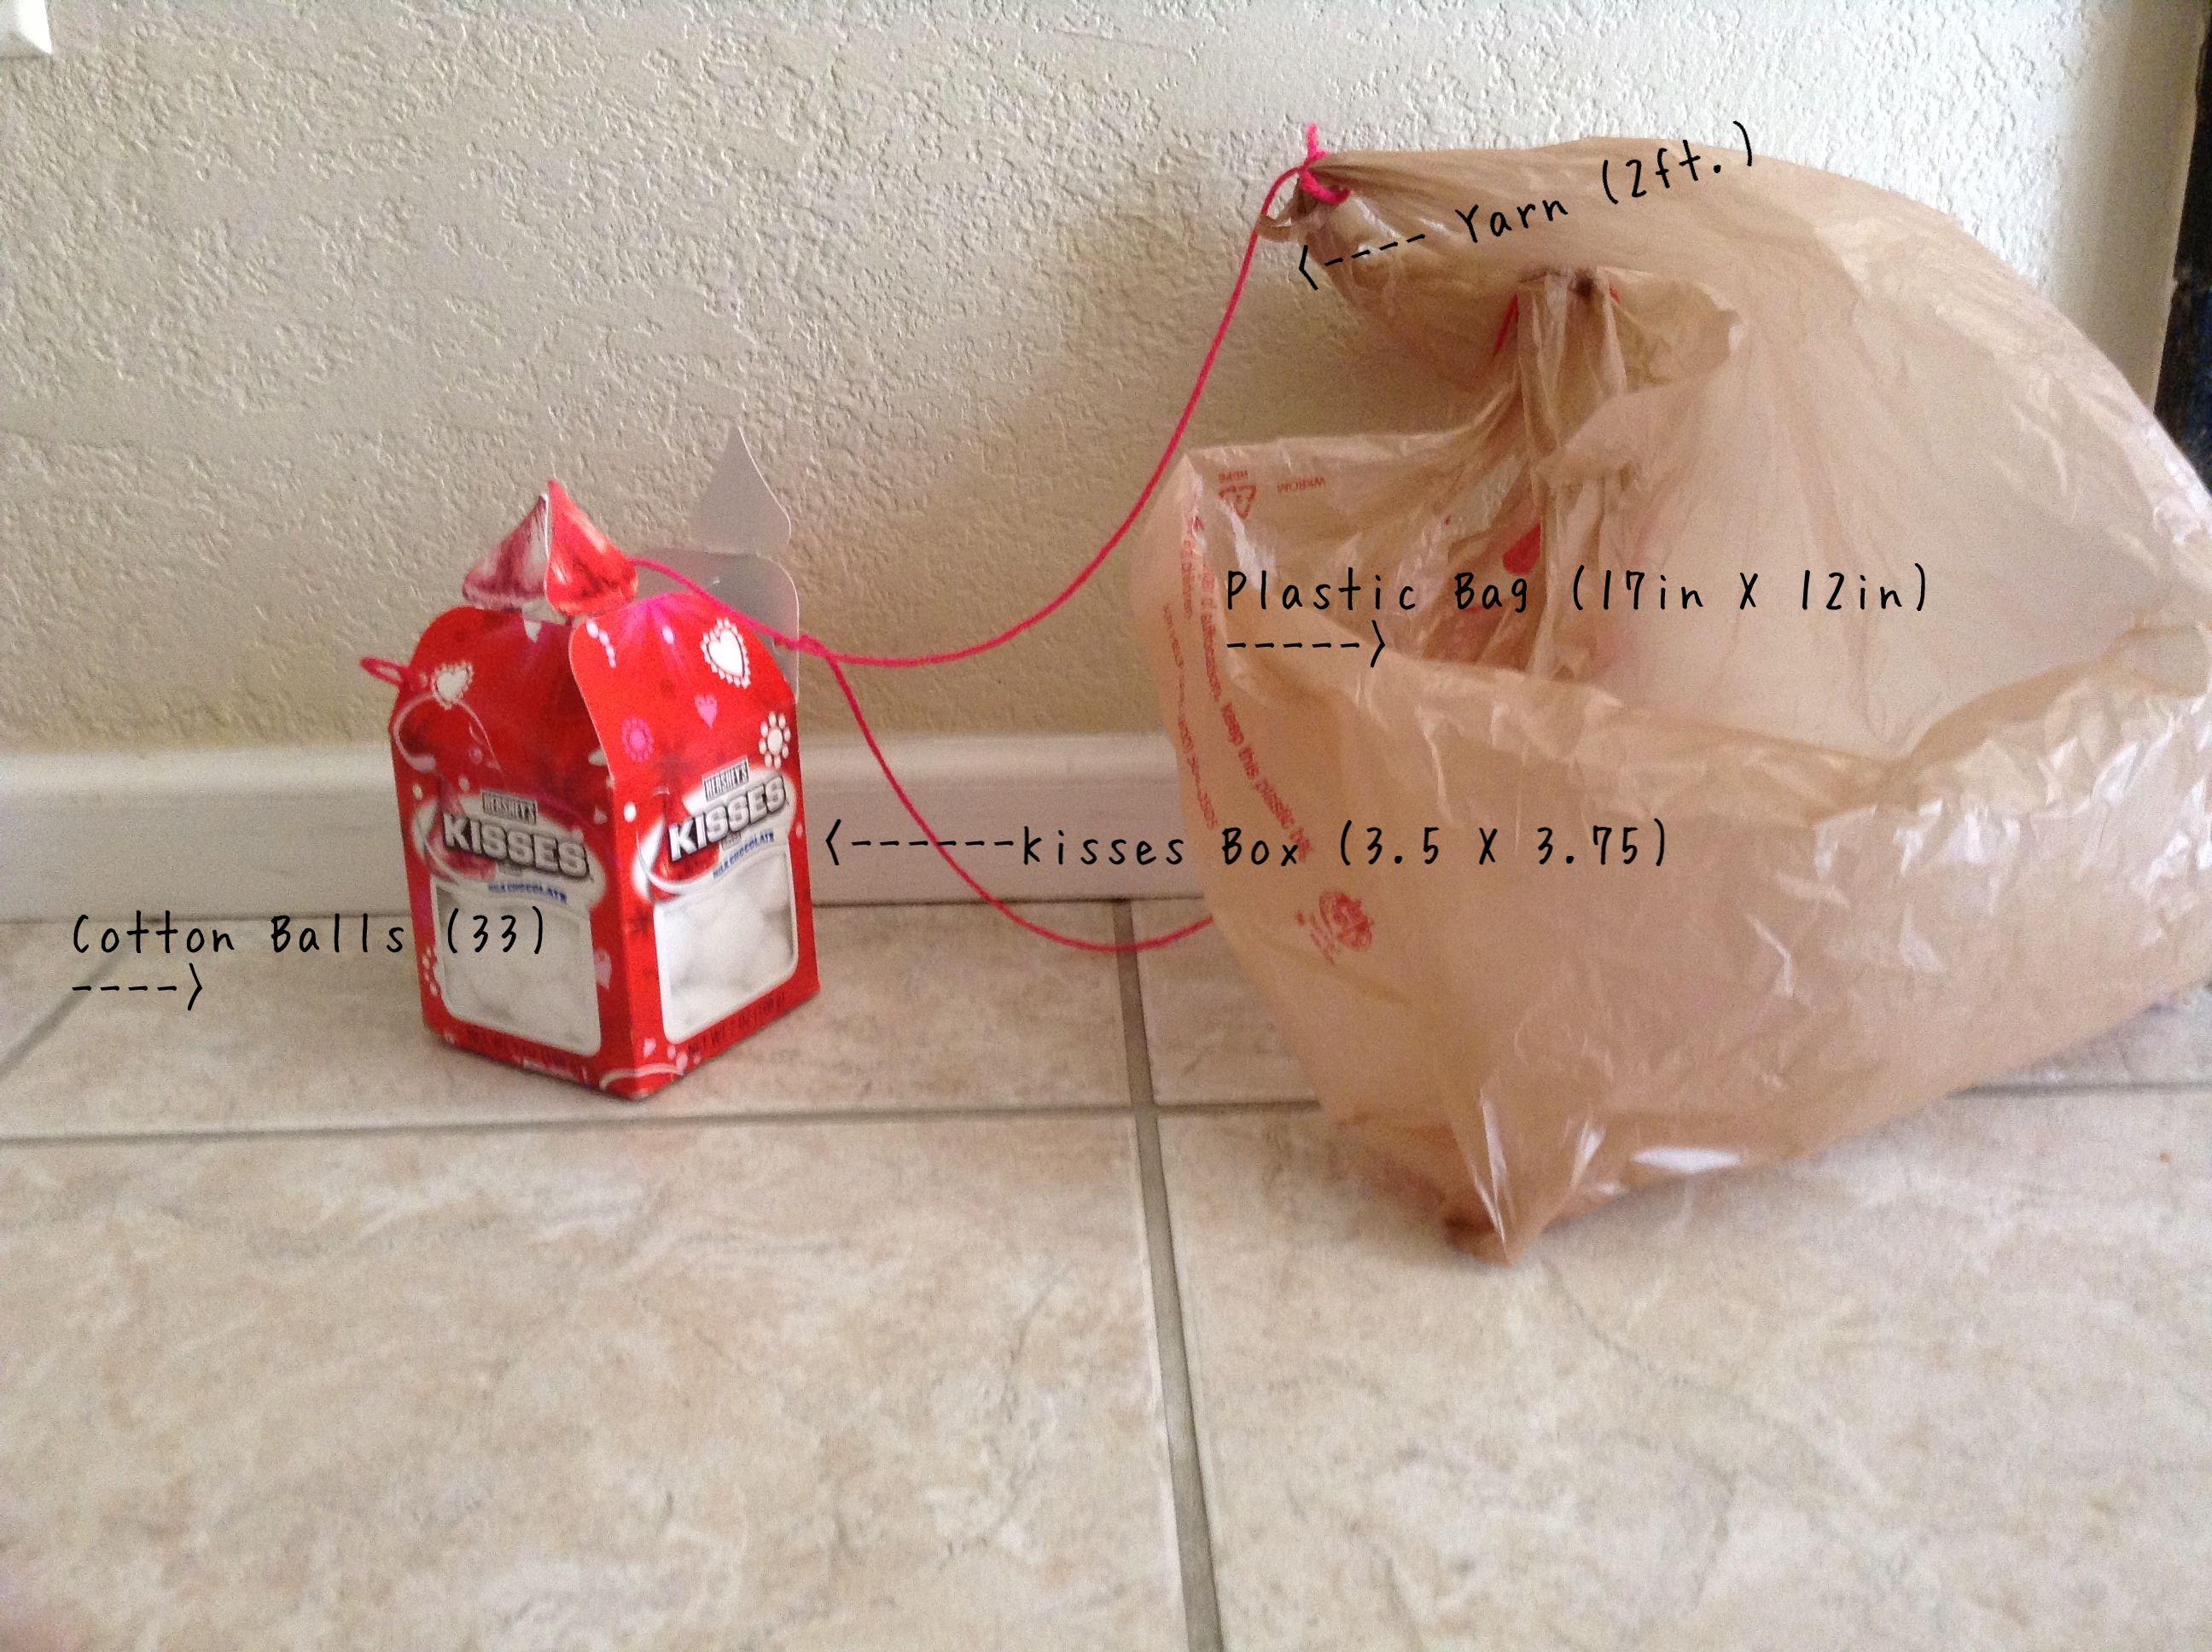 f815f108f756c5e8fd21812e049578f7 egg drop project for 6th graders diy project ideas pinterest